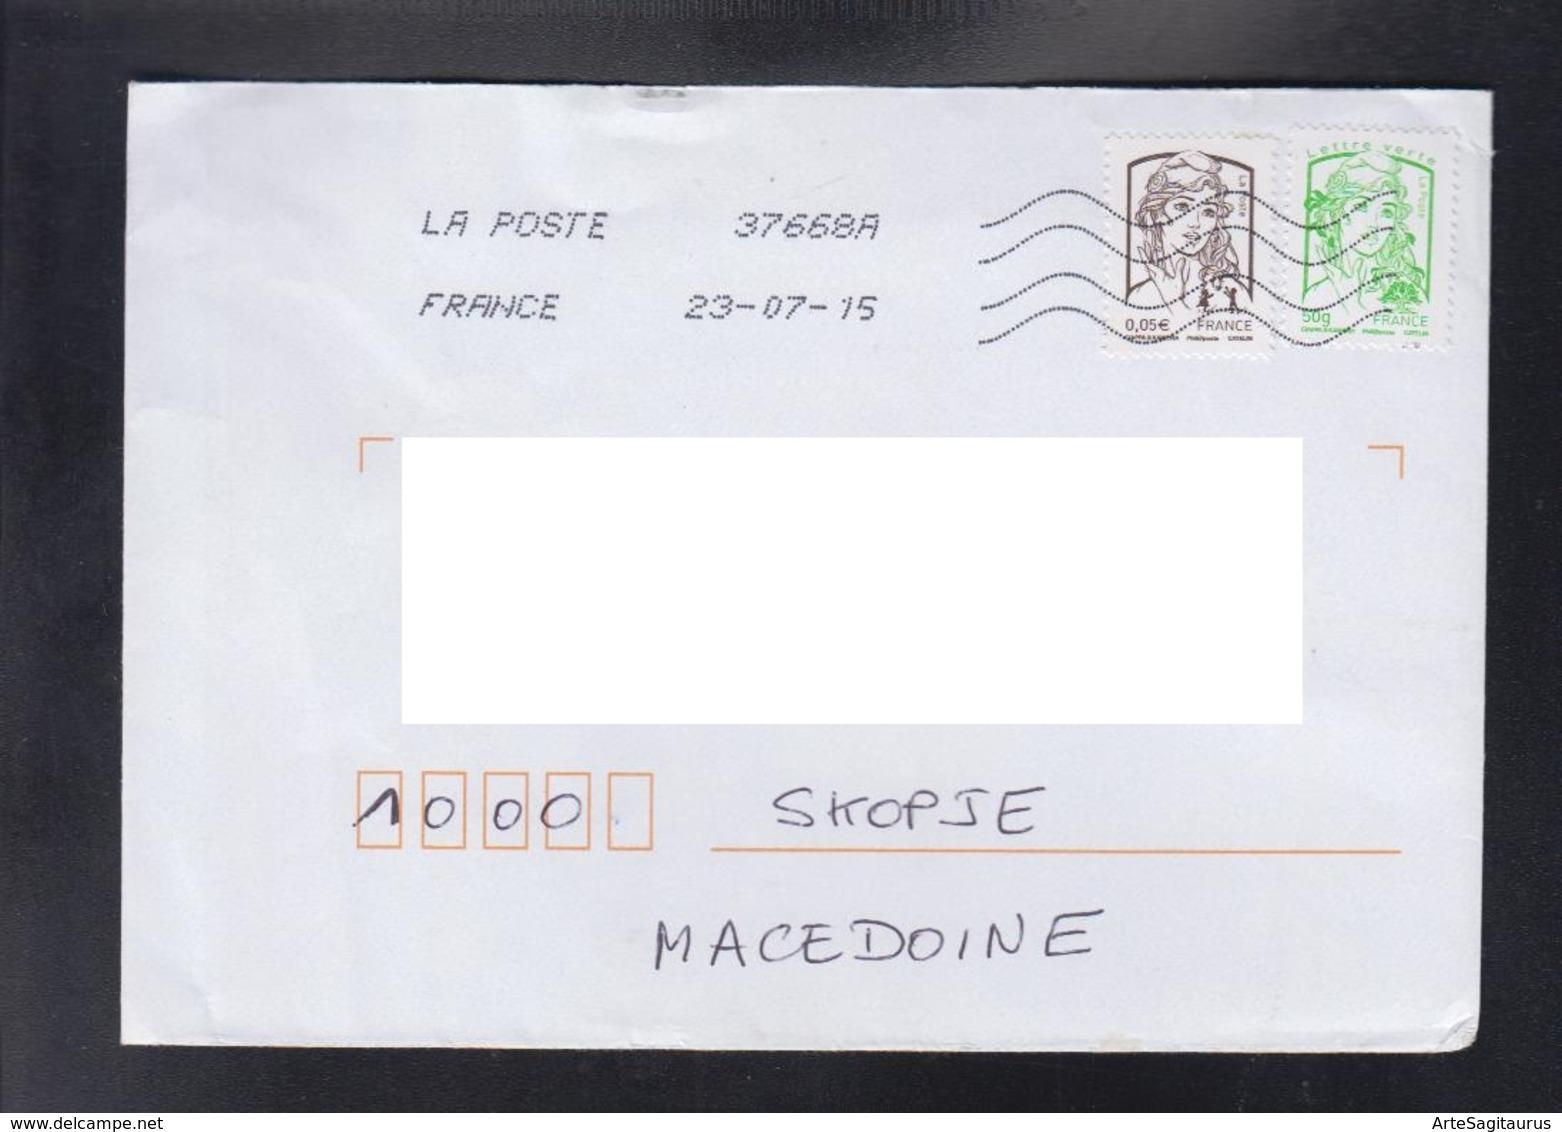 FRANCE, COVER / REPUBLIC OF MACEDONIA ** - 2013-... Marianne De Ciappa-Kawena